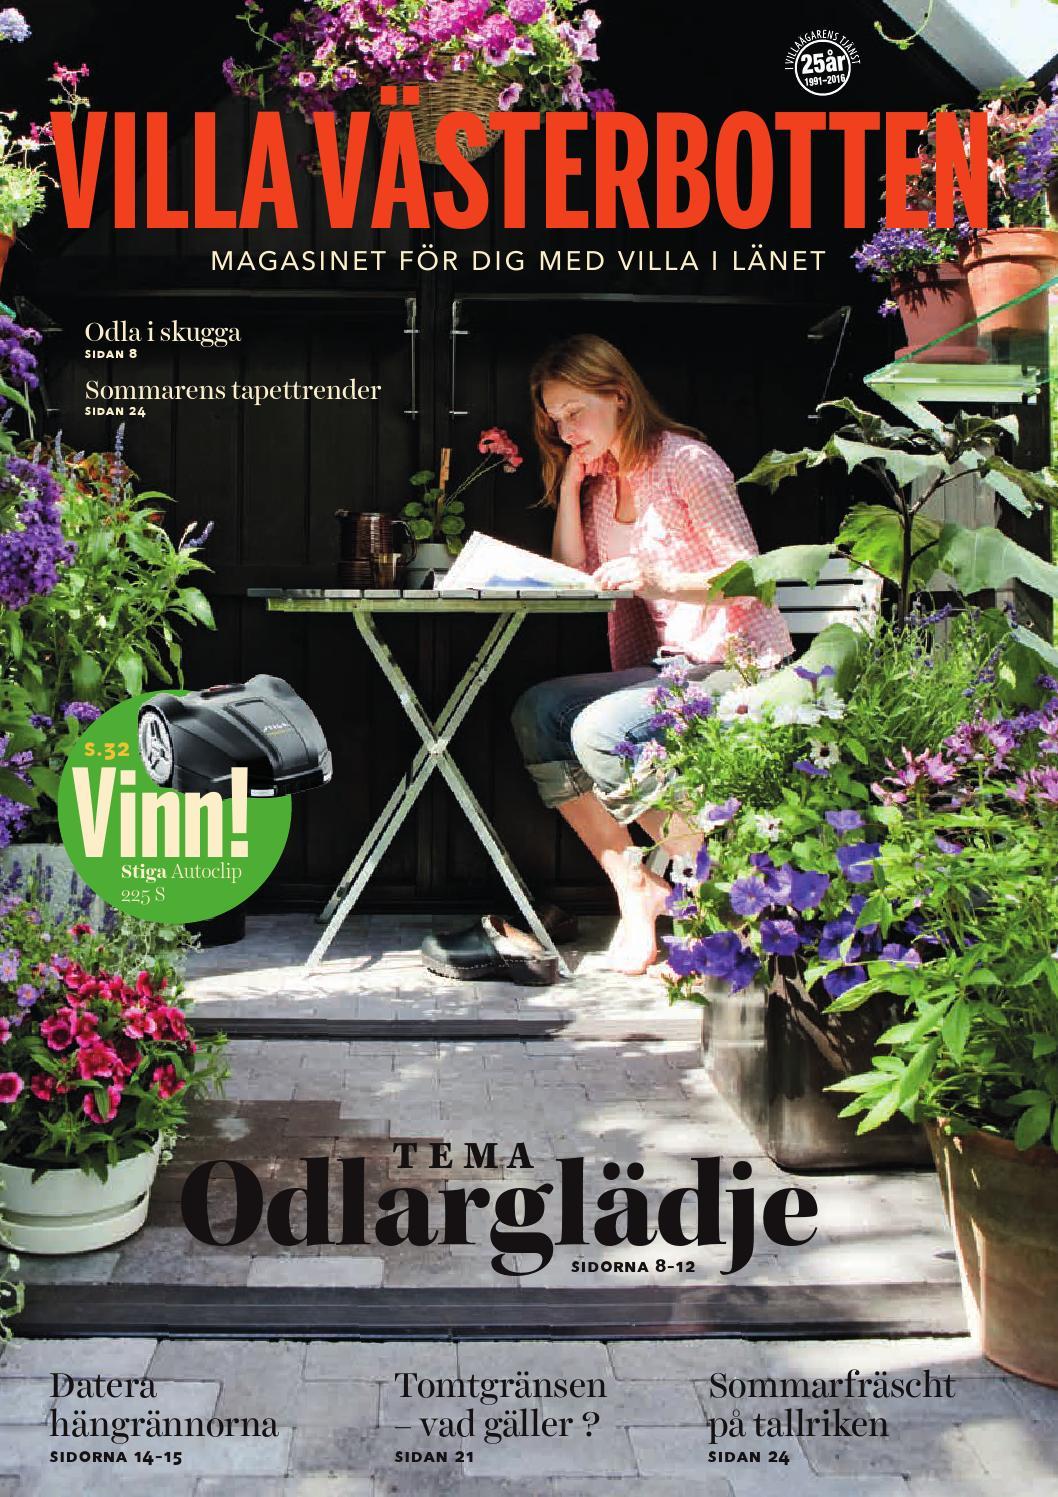 Sthlm trädgårdsmässa & villafamiljens mässa 2016 by adfaktor   issuu